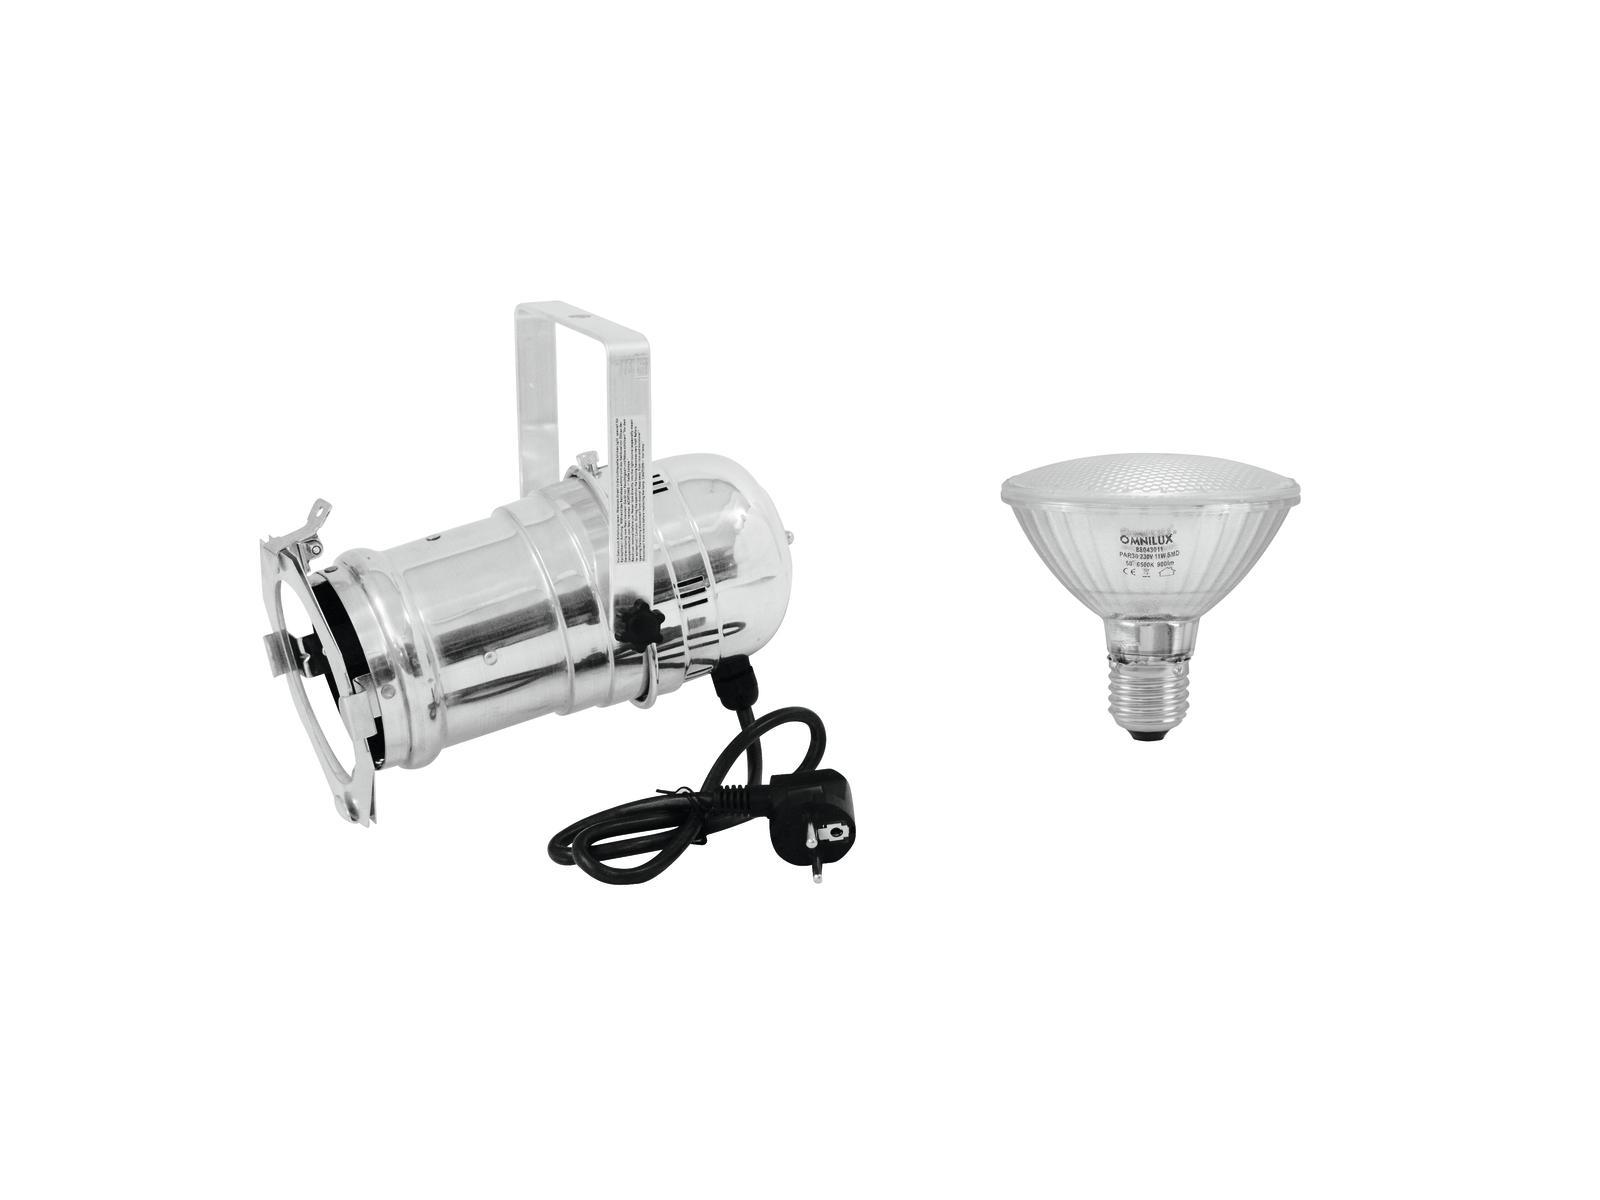 eurolite-set-par-30-spot-sil-par-30-230v-smd-11w-e-27-led-6500